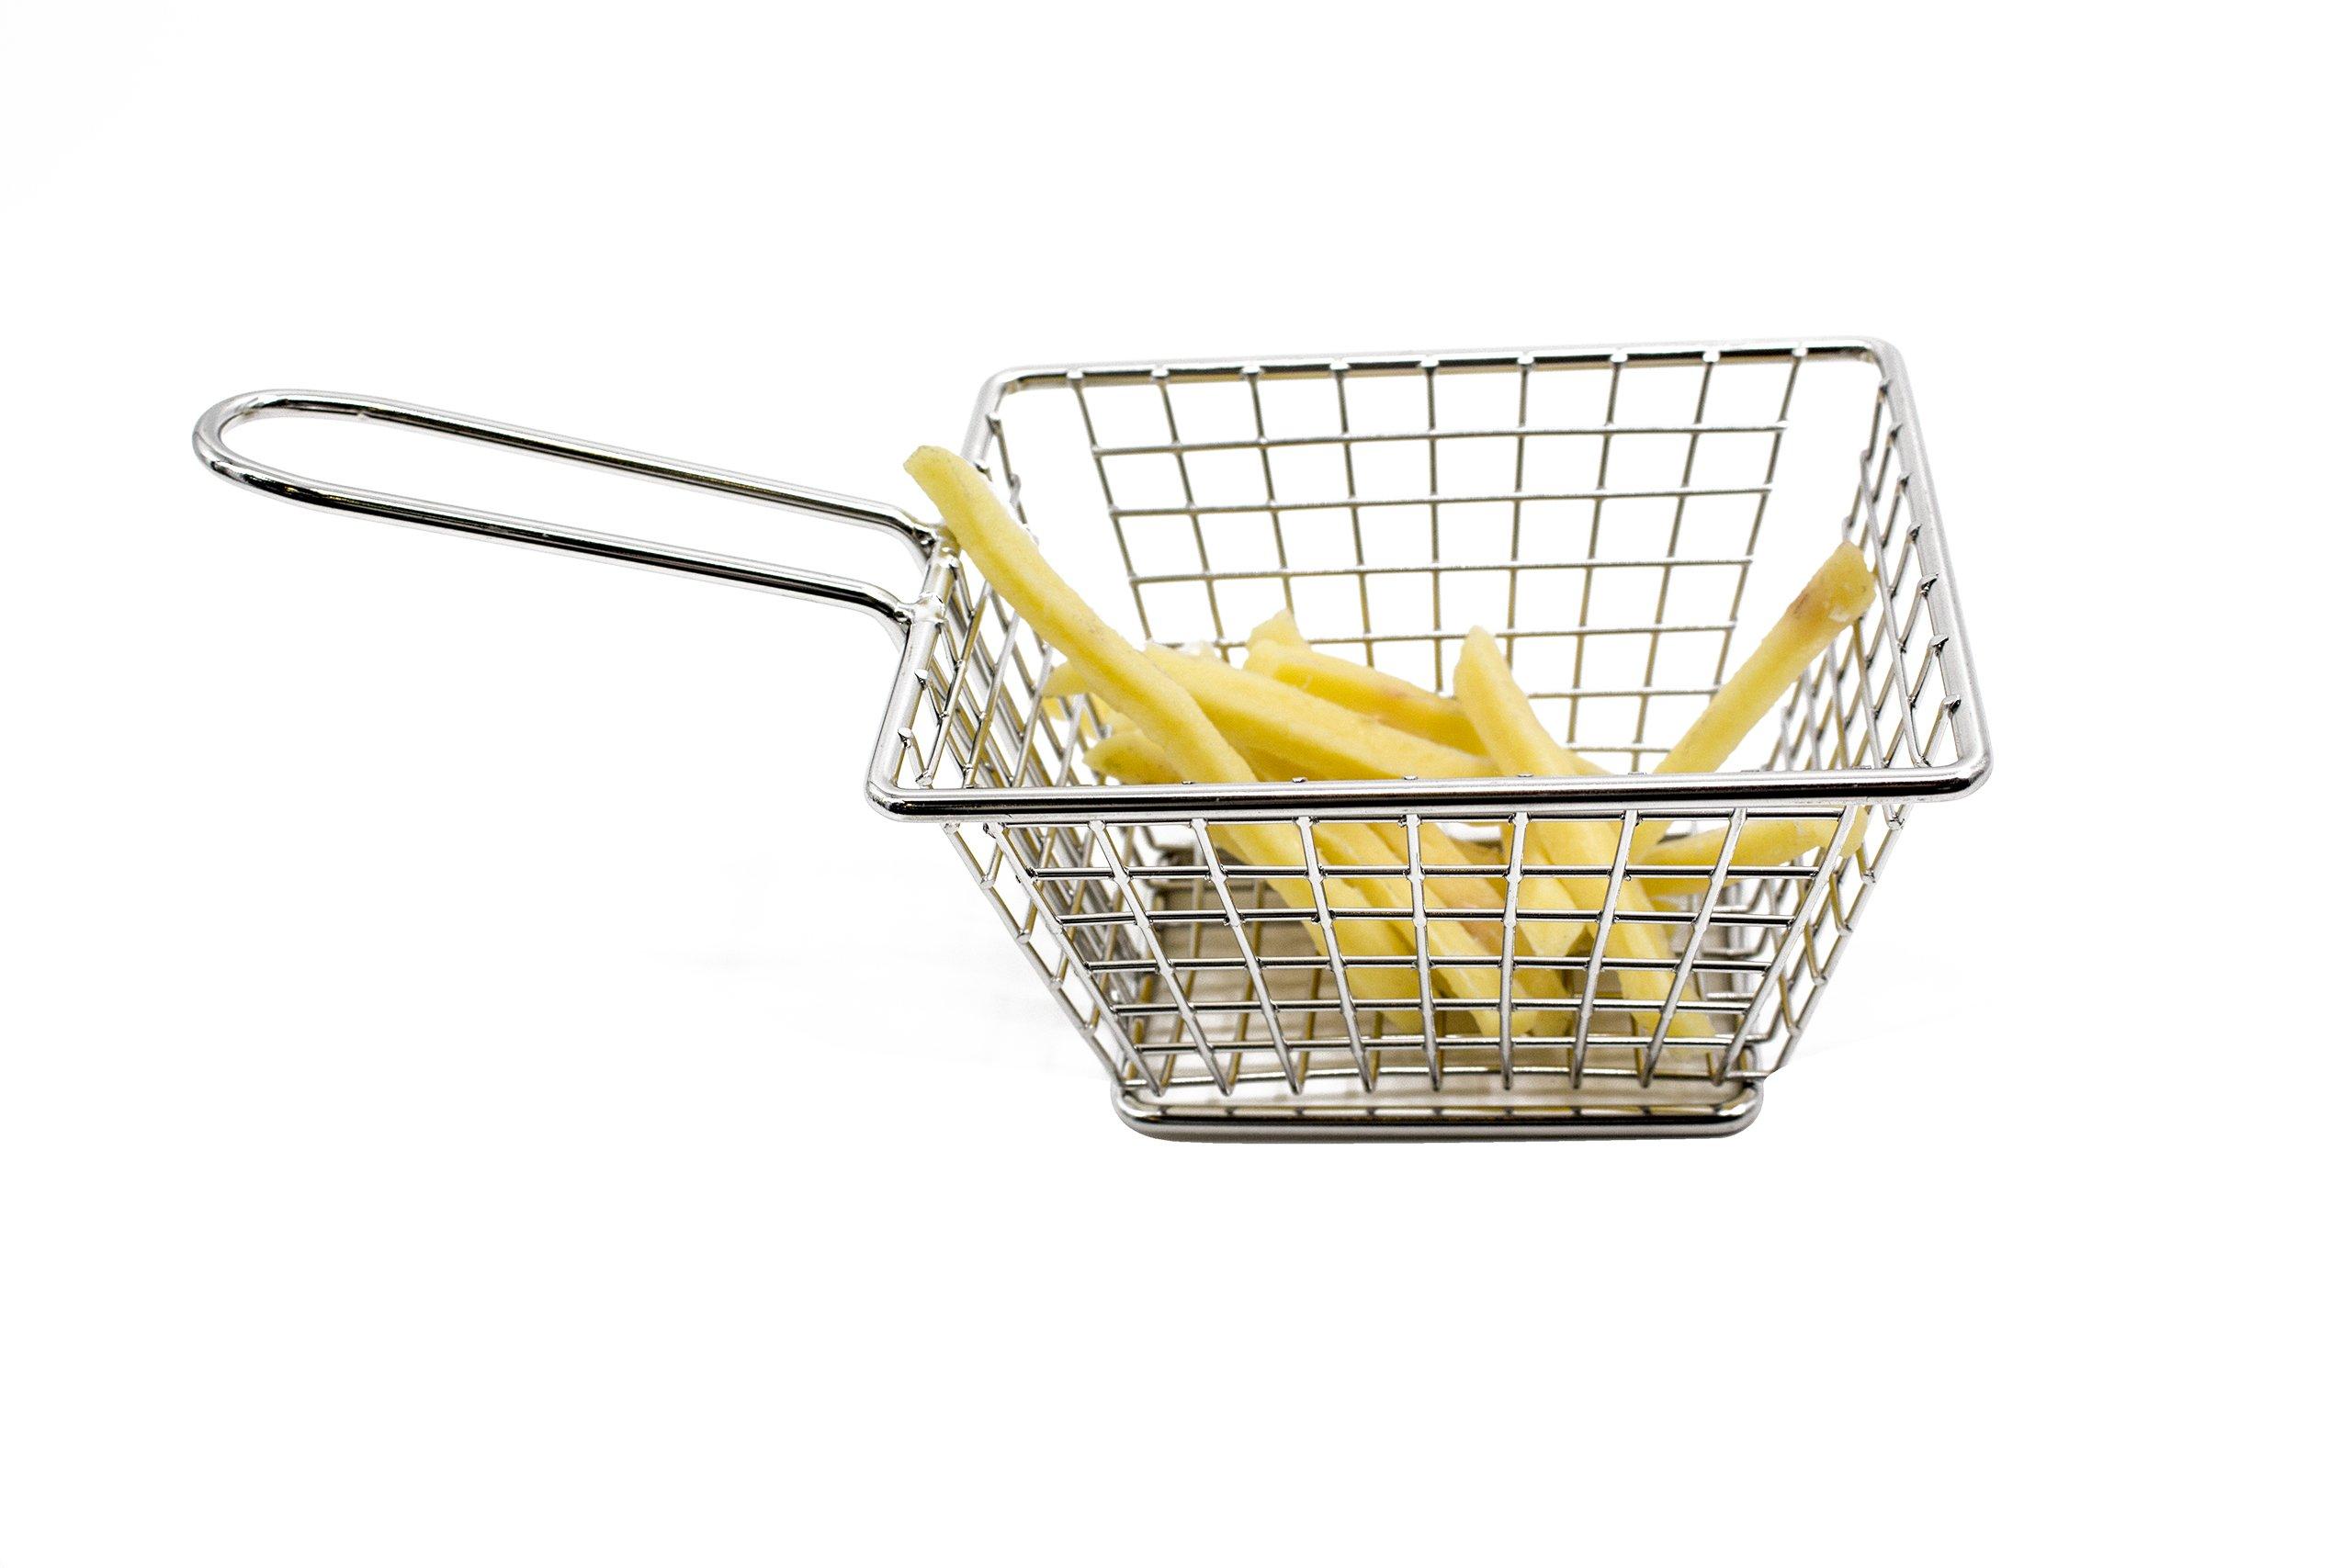 Baohao 304 stainless steel basket Fried chicken basket + V1 5.04''x4.02''x2.95''